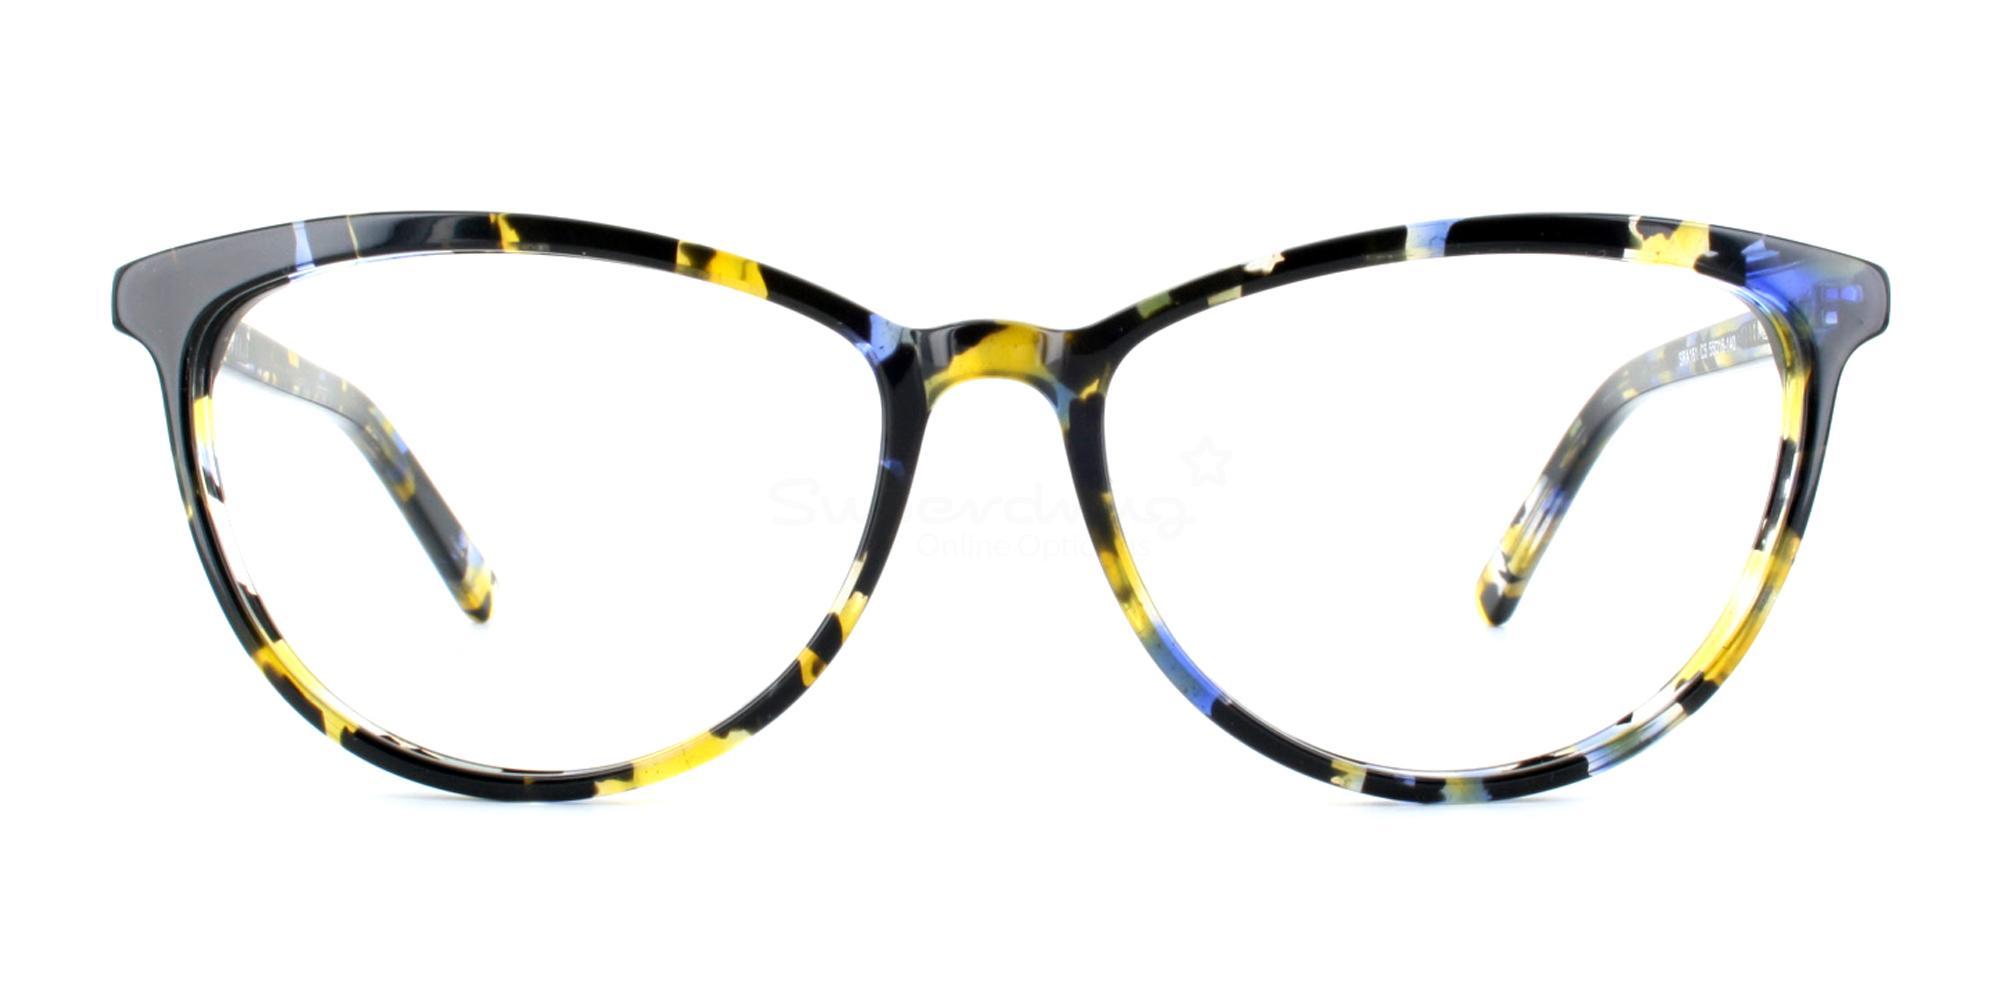 C5 SRA161 Glasses, Neon